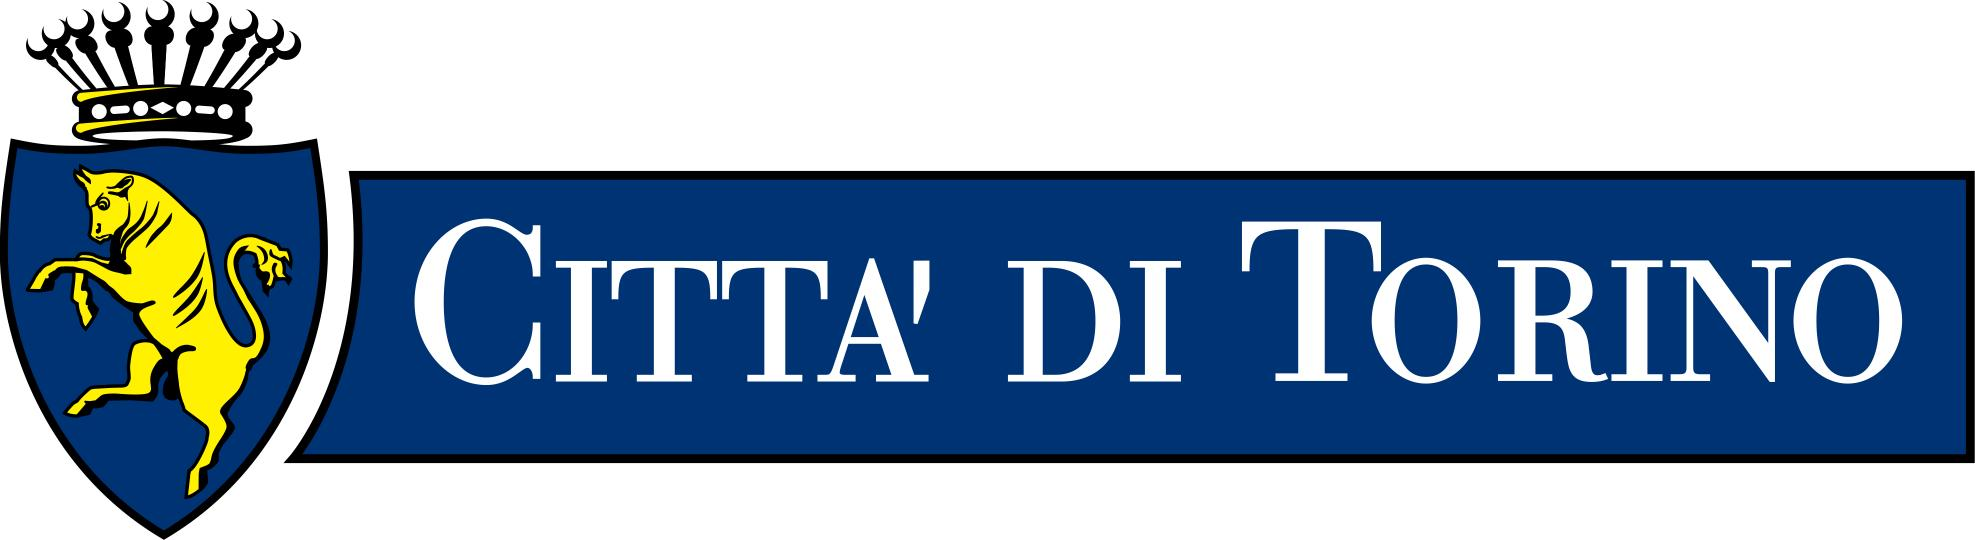 logo_citta_torino